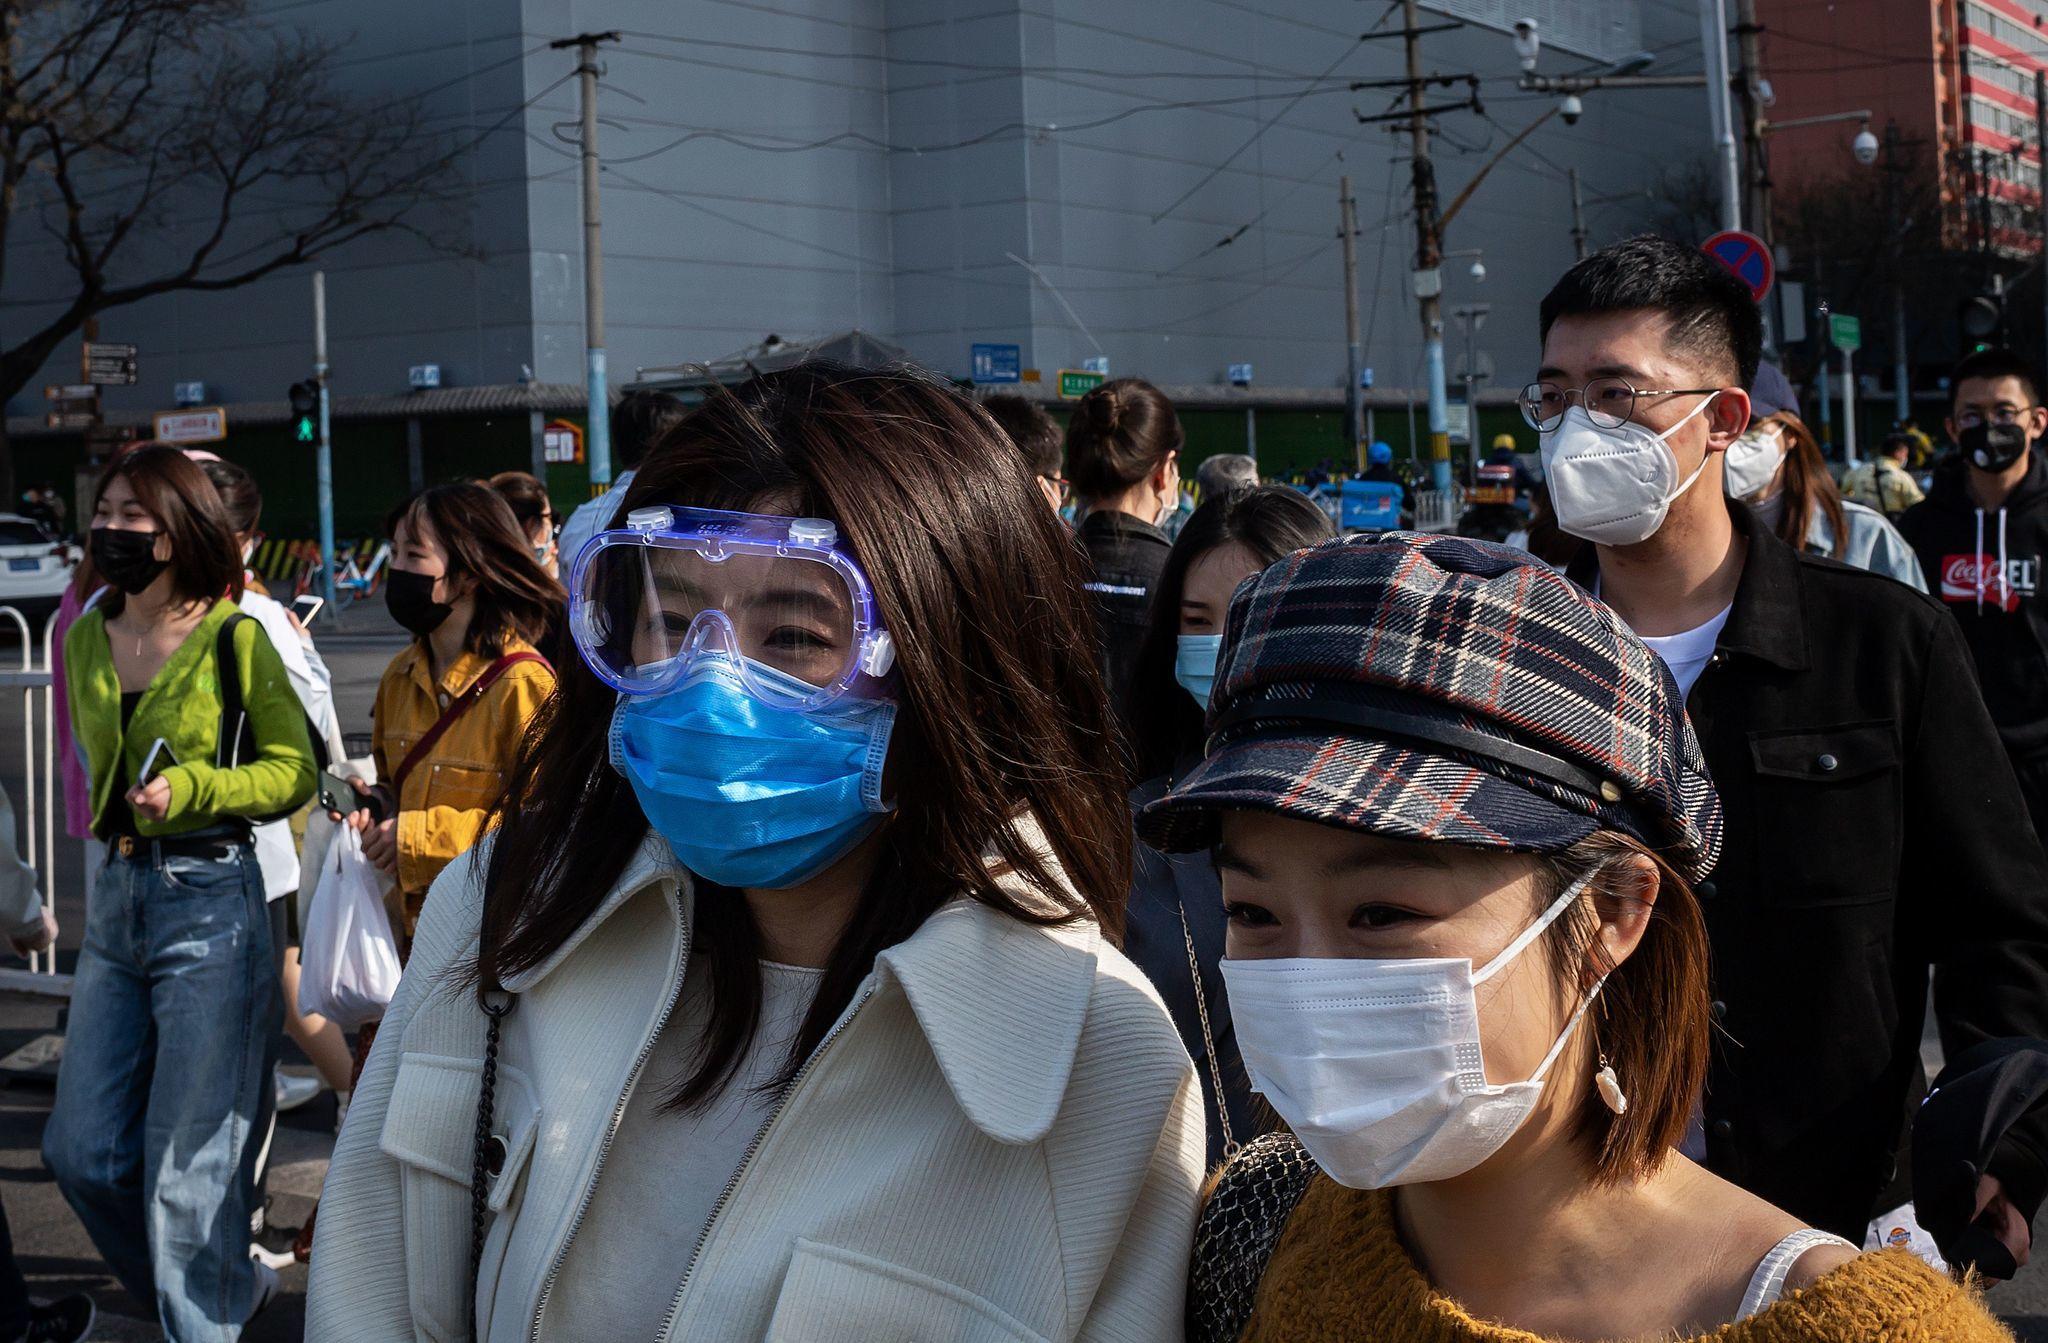 China ends coronavirus lockdown, massive crowds converge upon destination spots